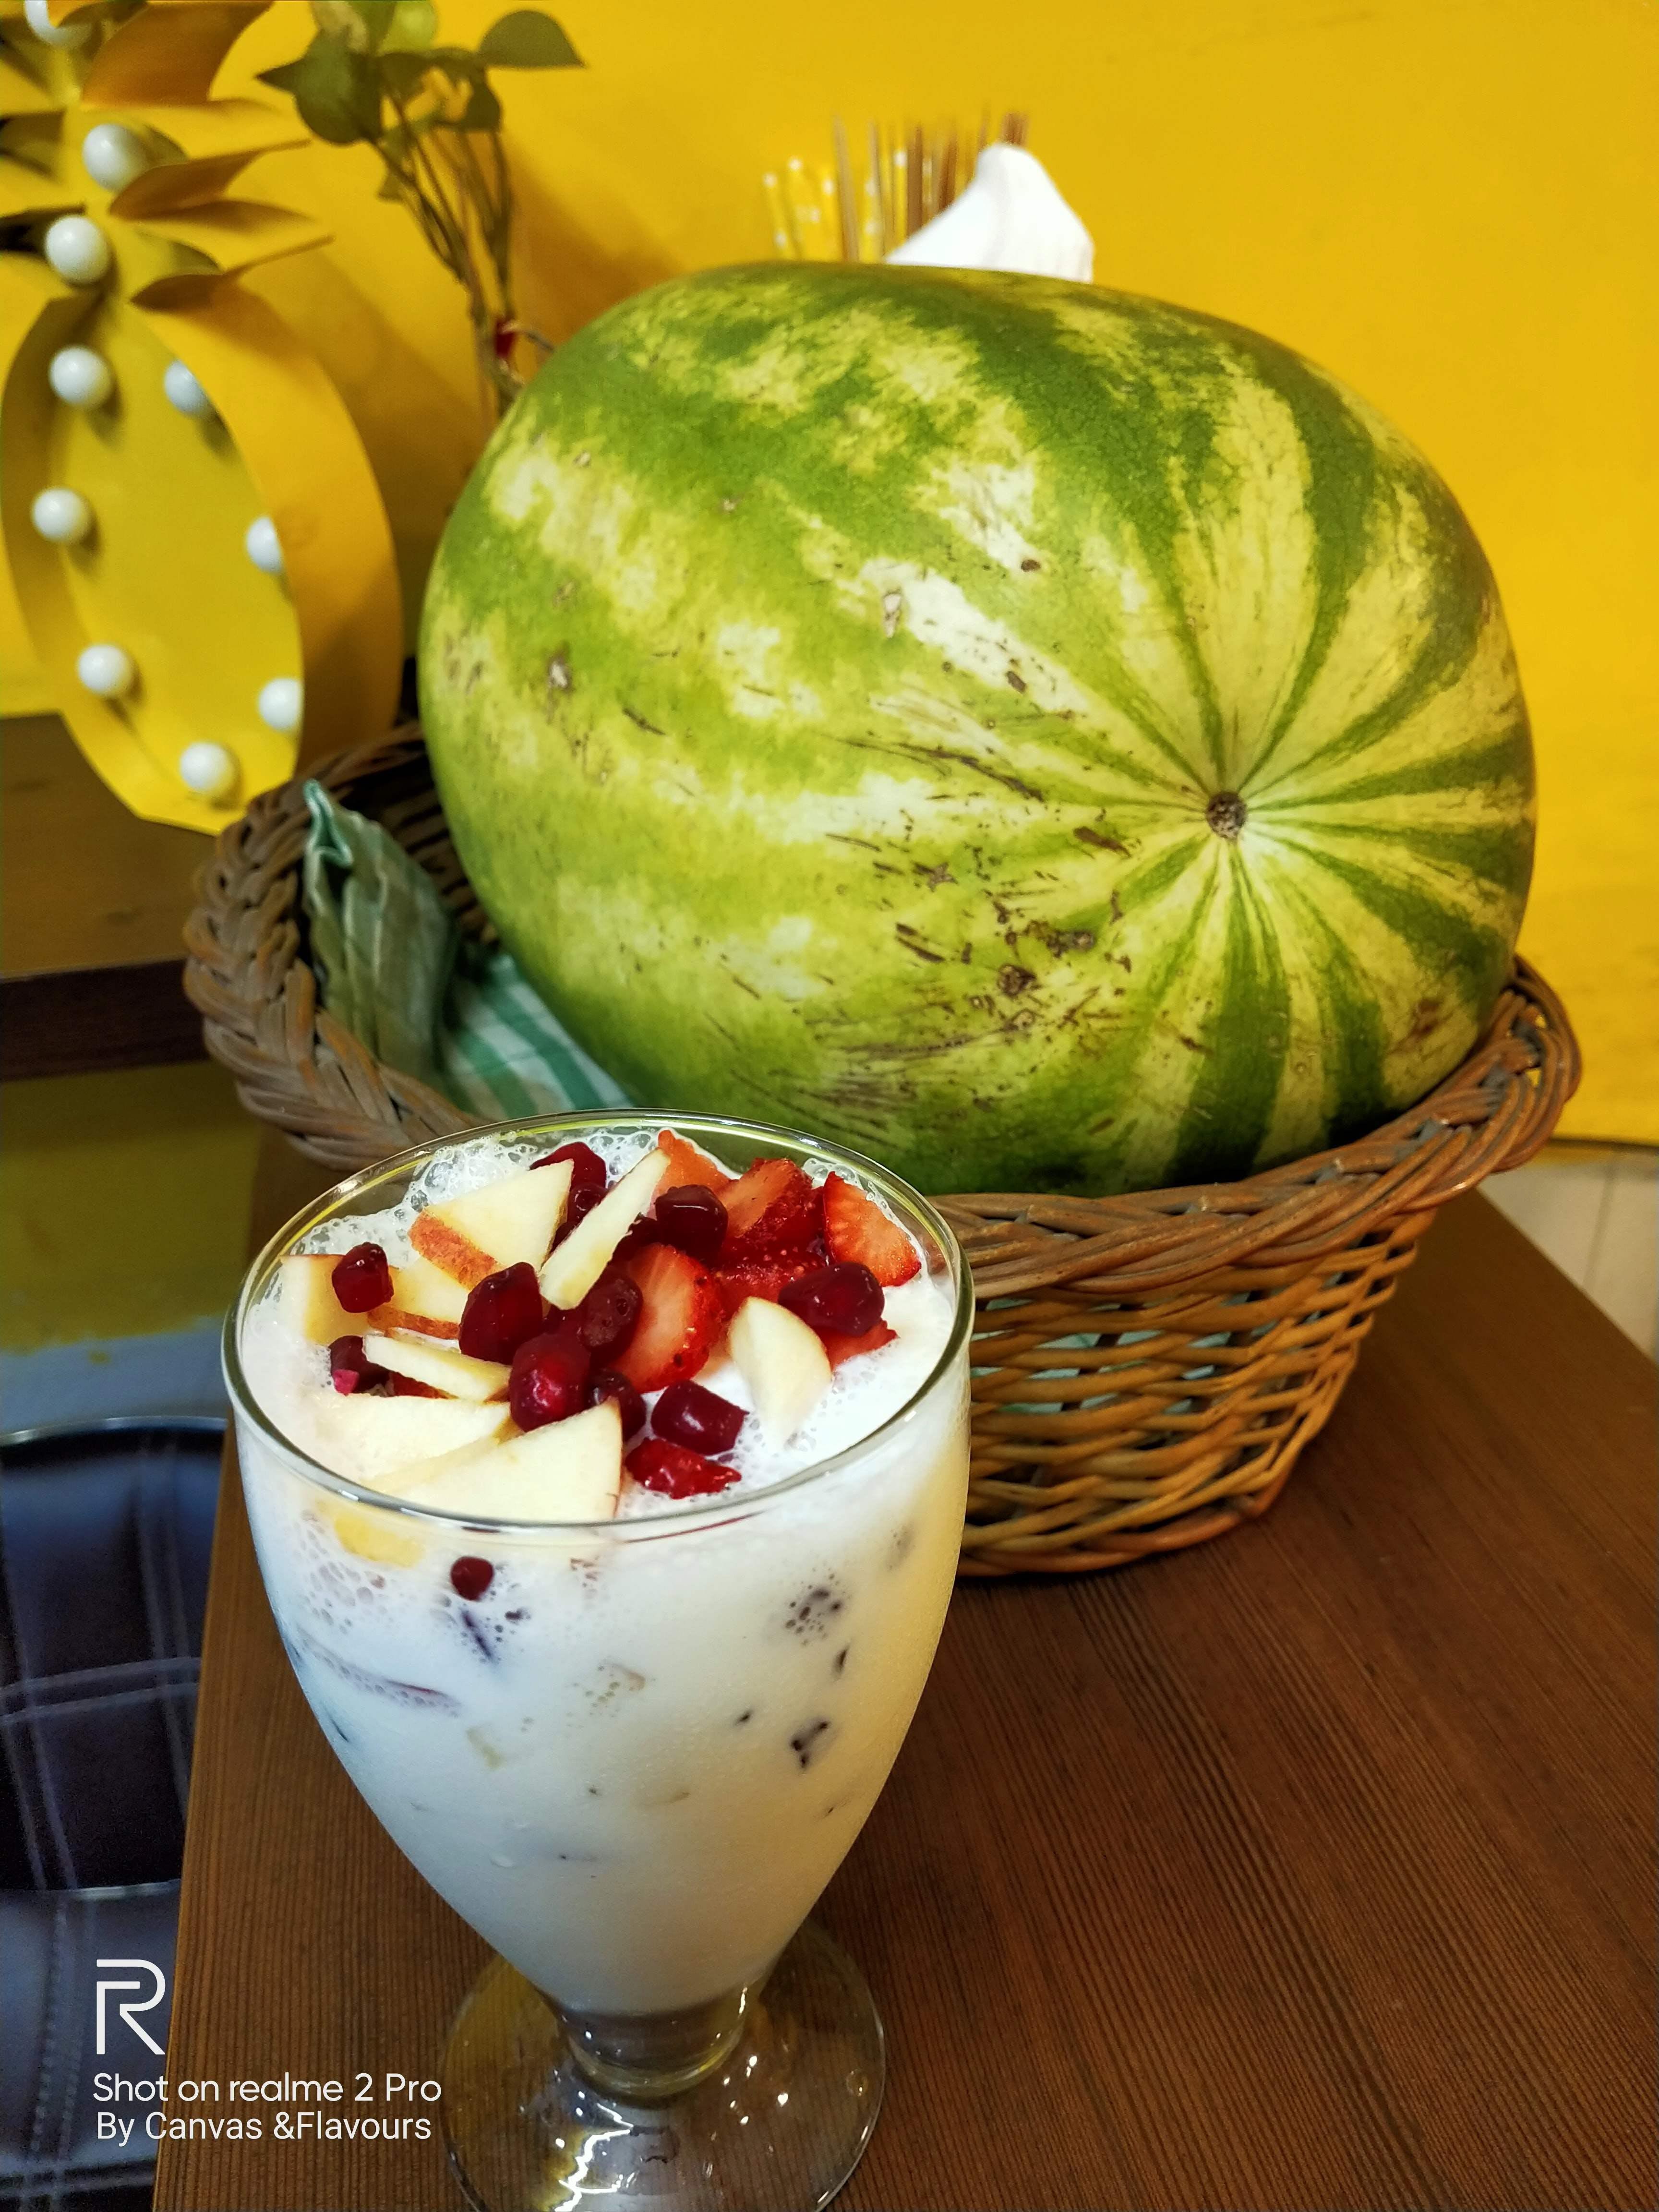 Food,Fruit,Dish,Cuisine,Vegetarian food,Ingredient,Melon,Plant,Produce,Fruit salad